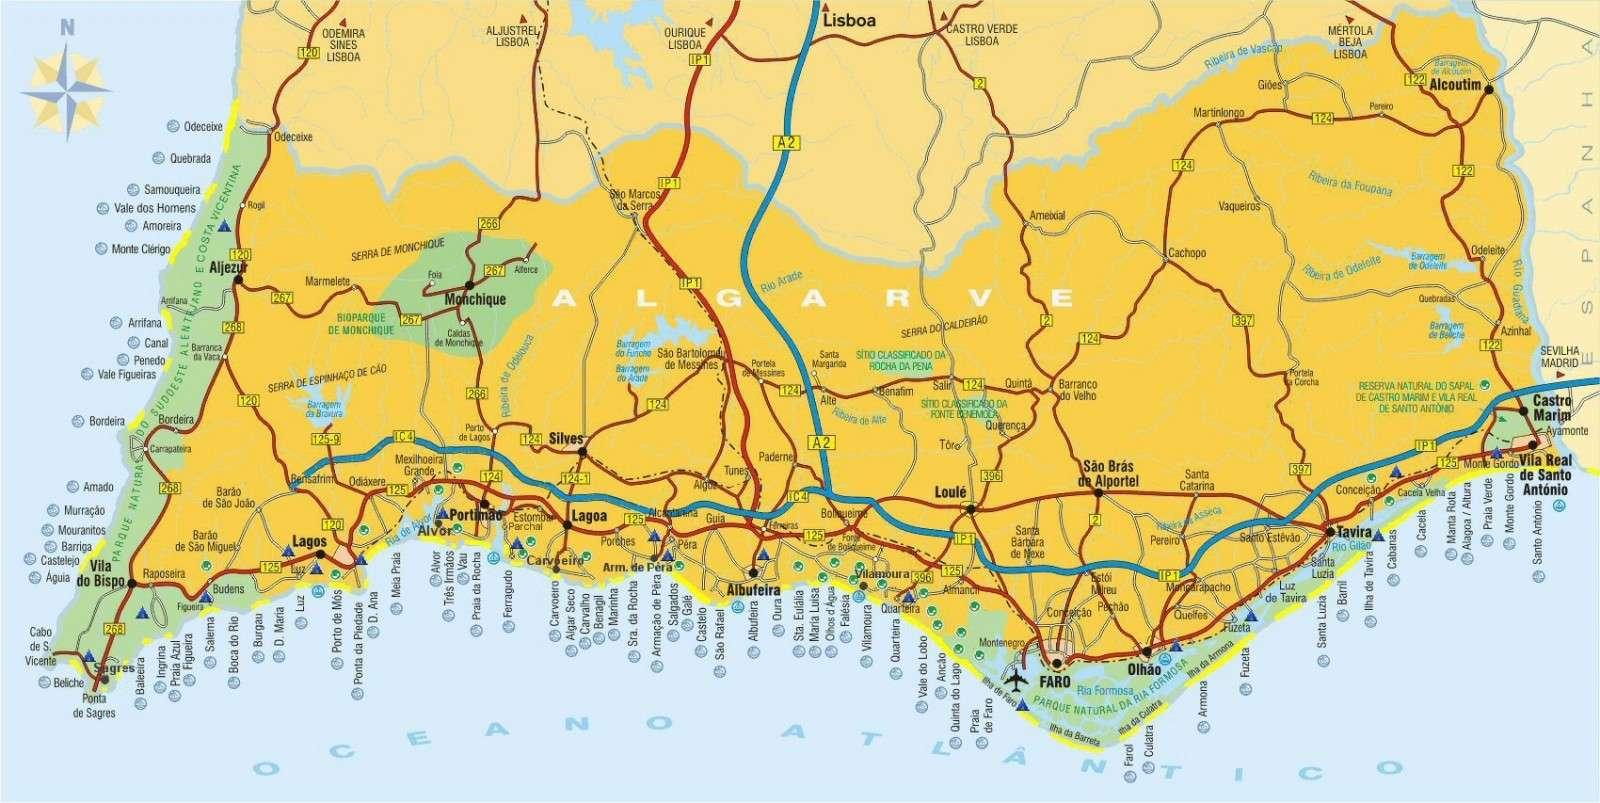 Algarven kartta